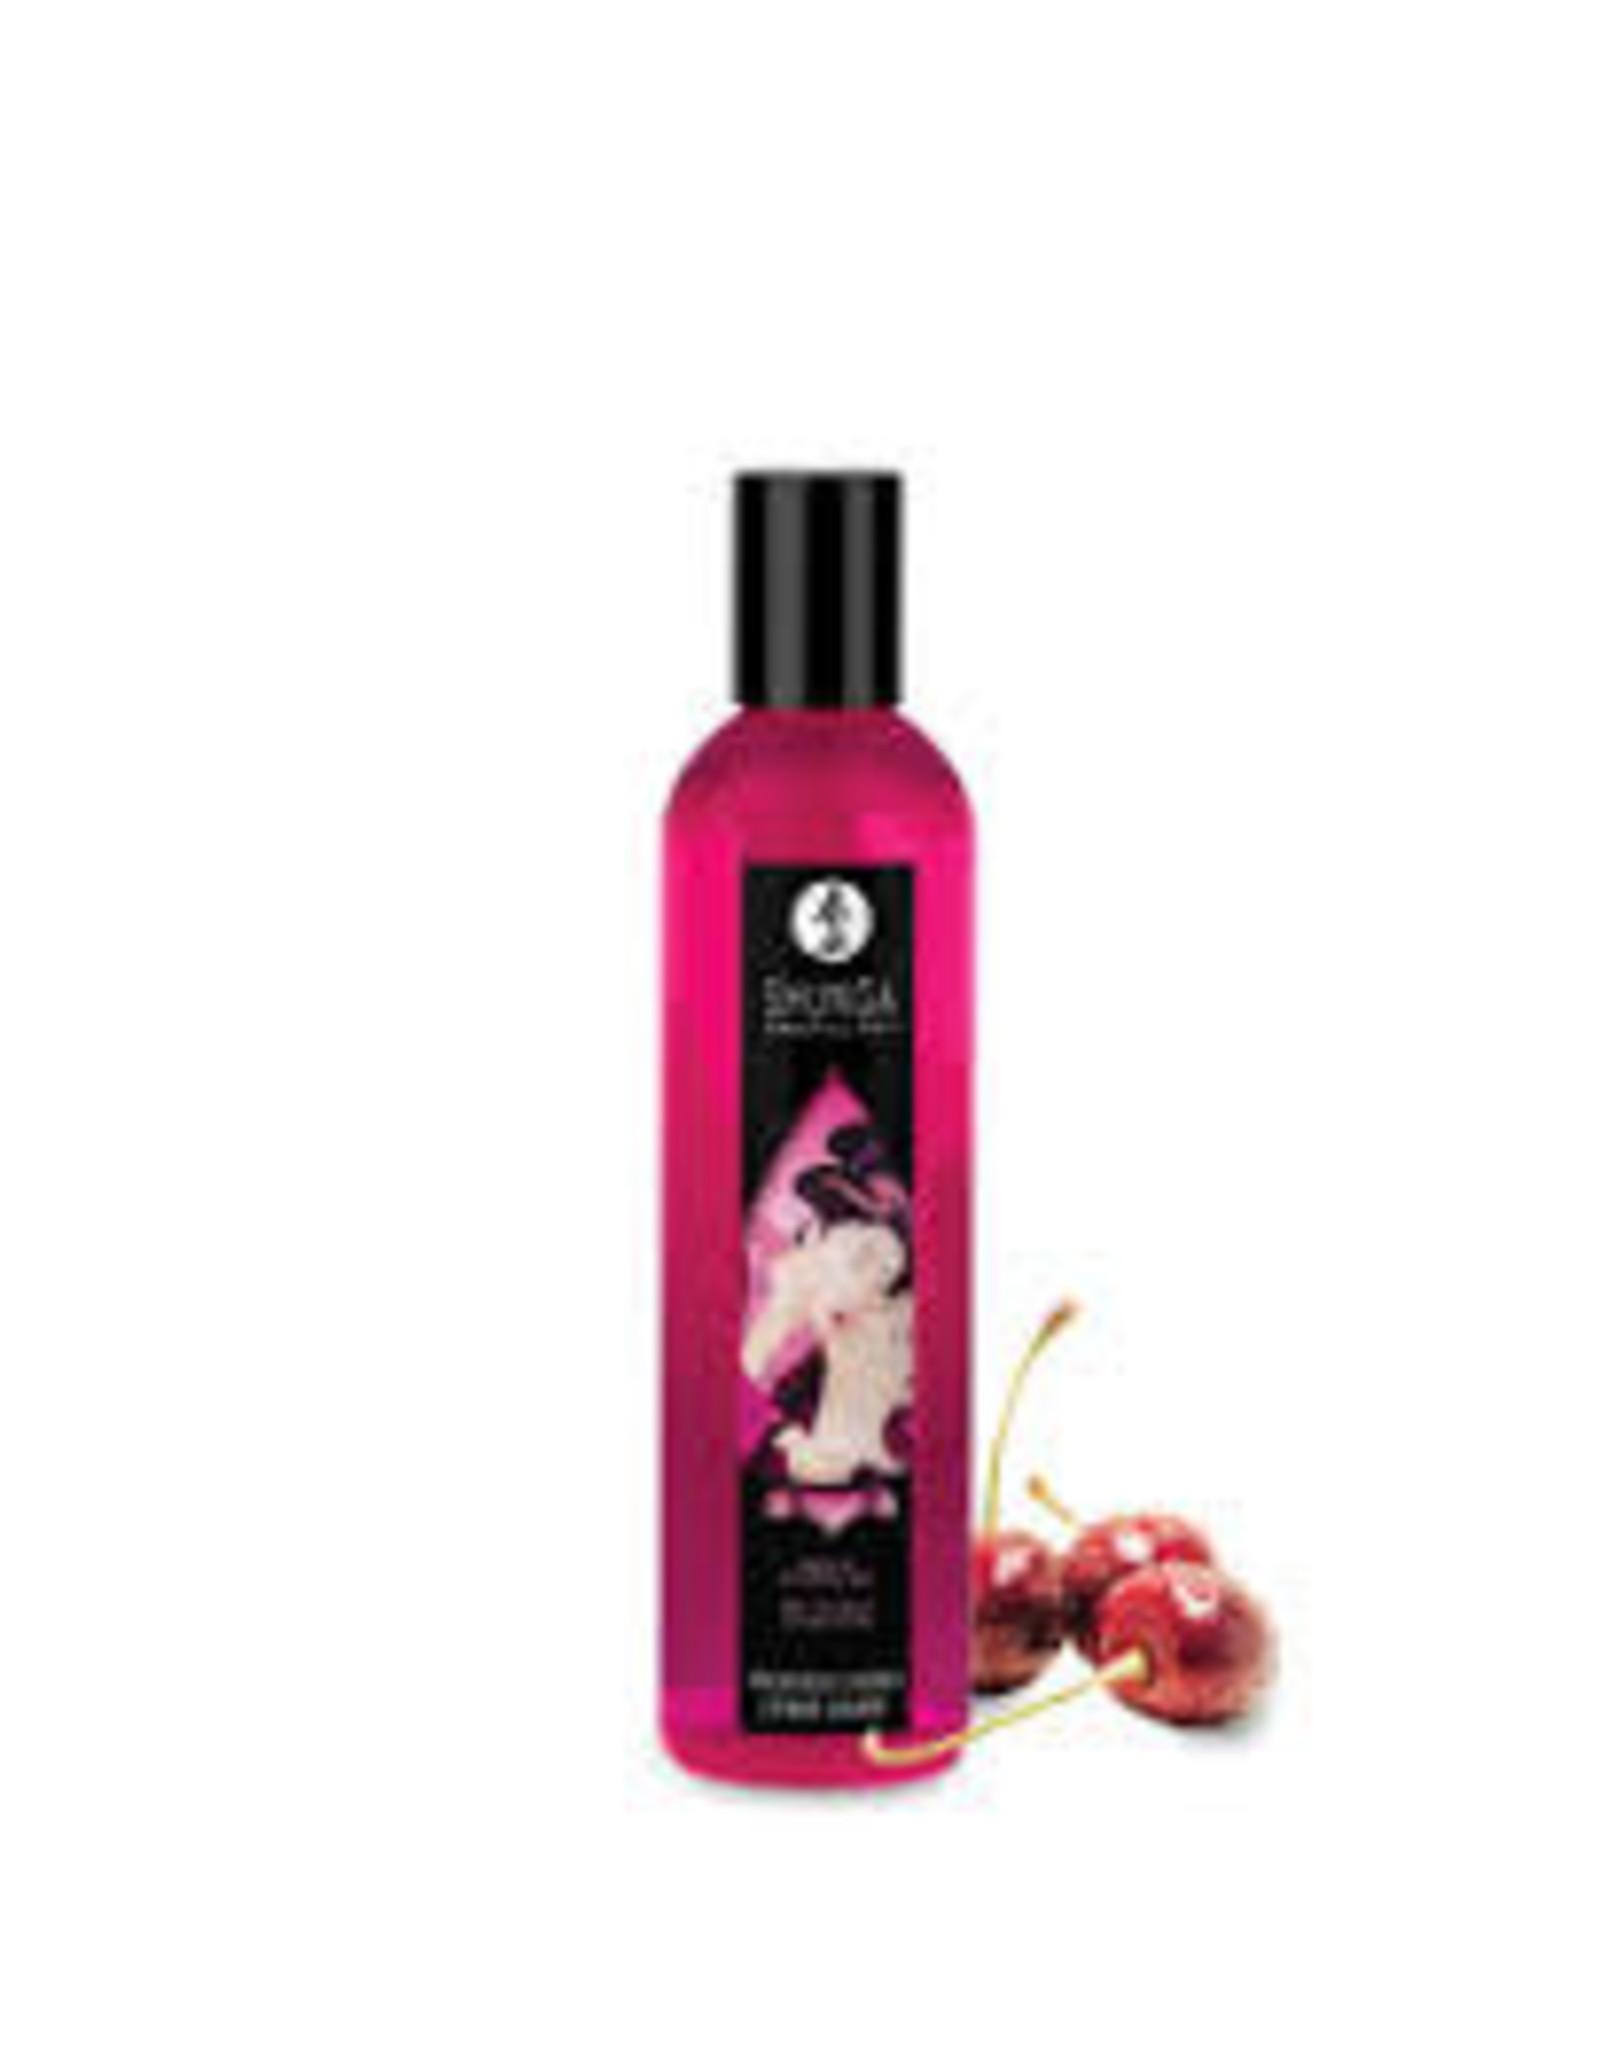 Shunga Shunga - Bath & Shower Gel Frosted Cherry